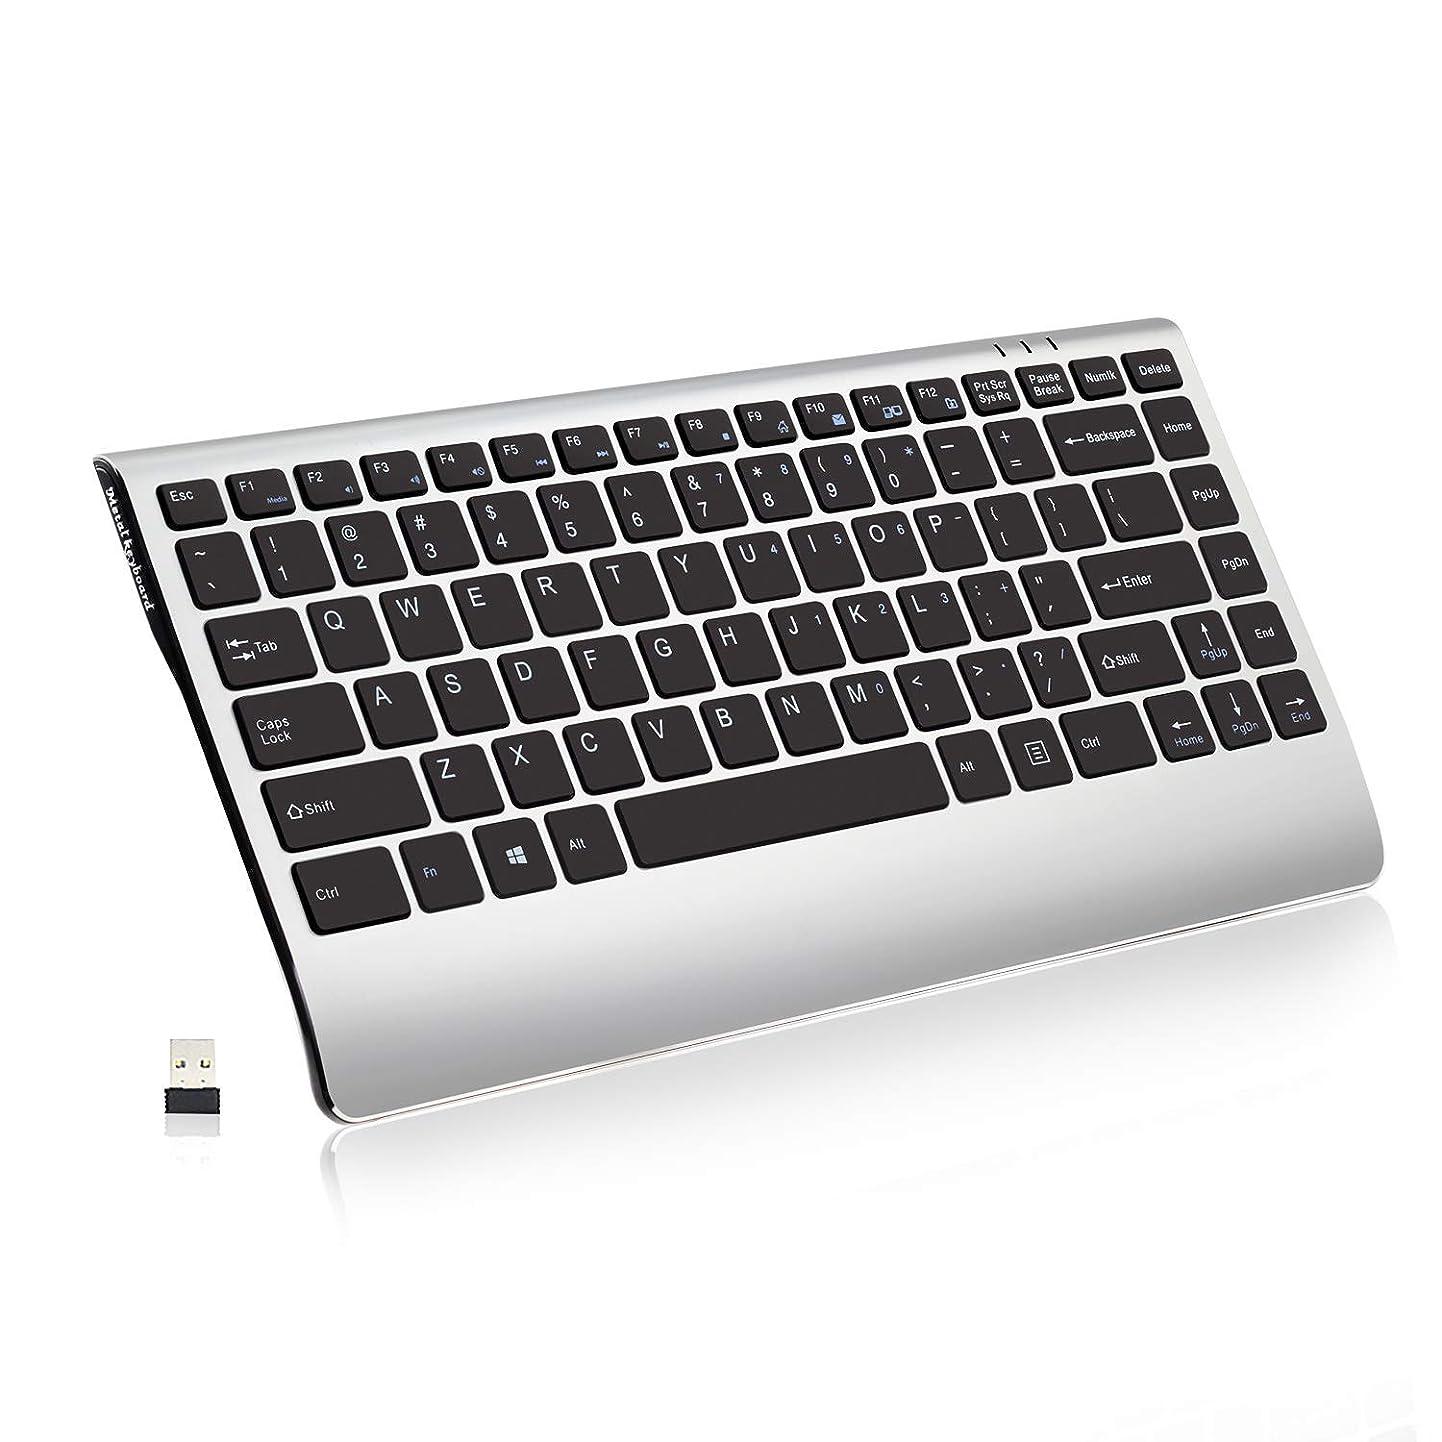 Wireless Keyboard, 2.4GHz Slim Compact Low-Profile Rechargeable Wireless Keyboard for Laptop, Mac, Notebook, PC, Desktop, Computer, Windows 10/7/XP, iOS, Soundance Black and Silver oxswotpcwfq7